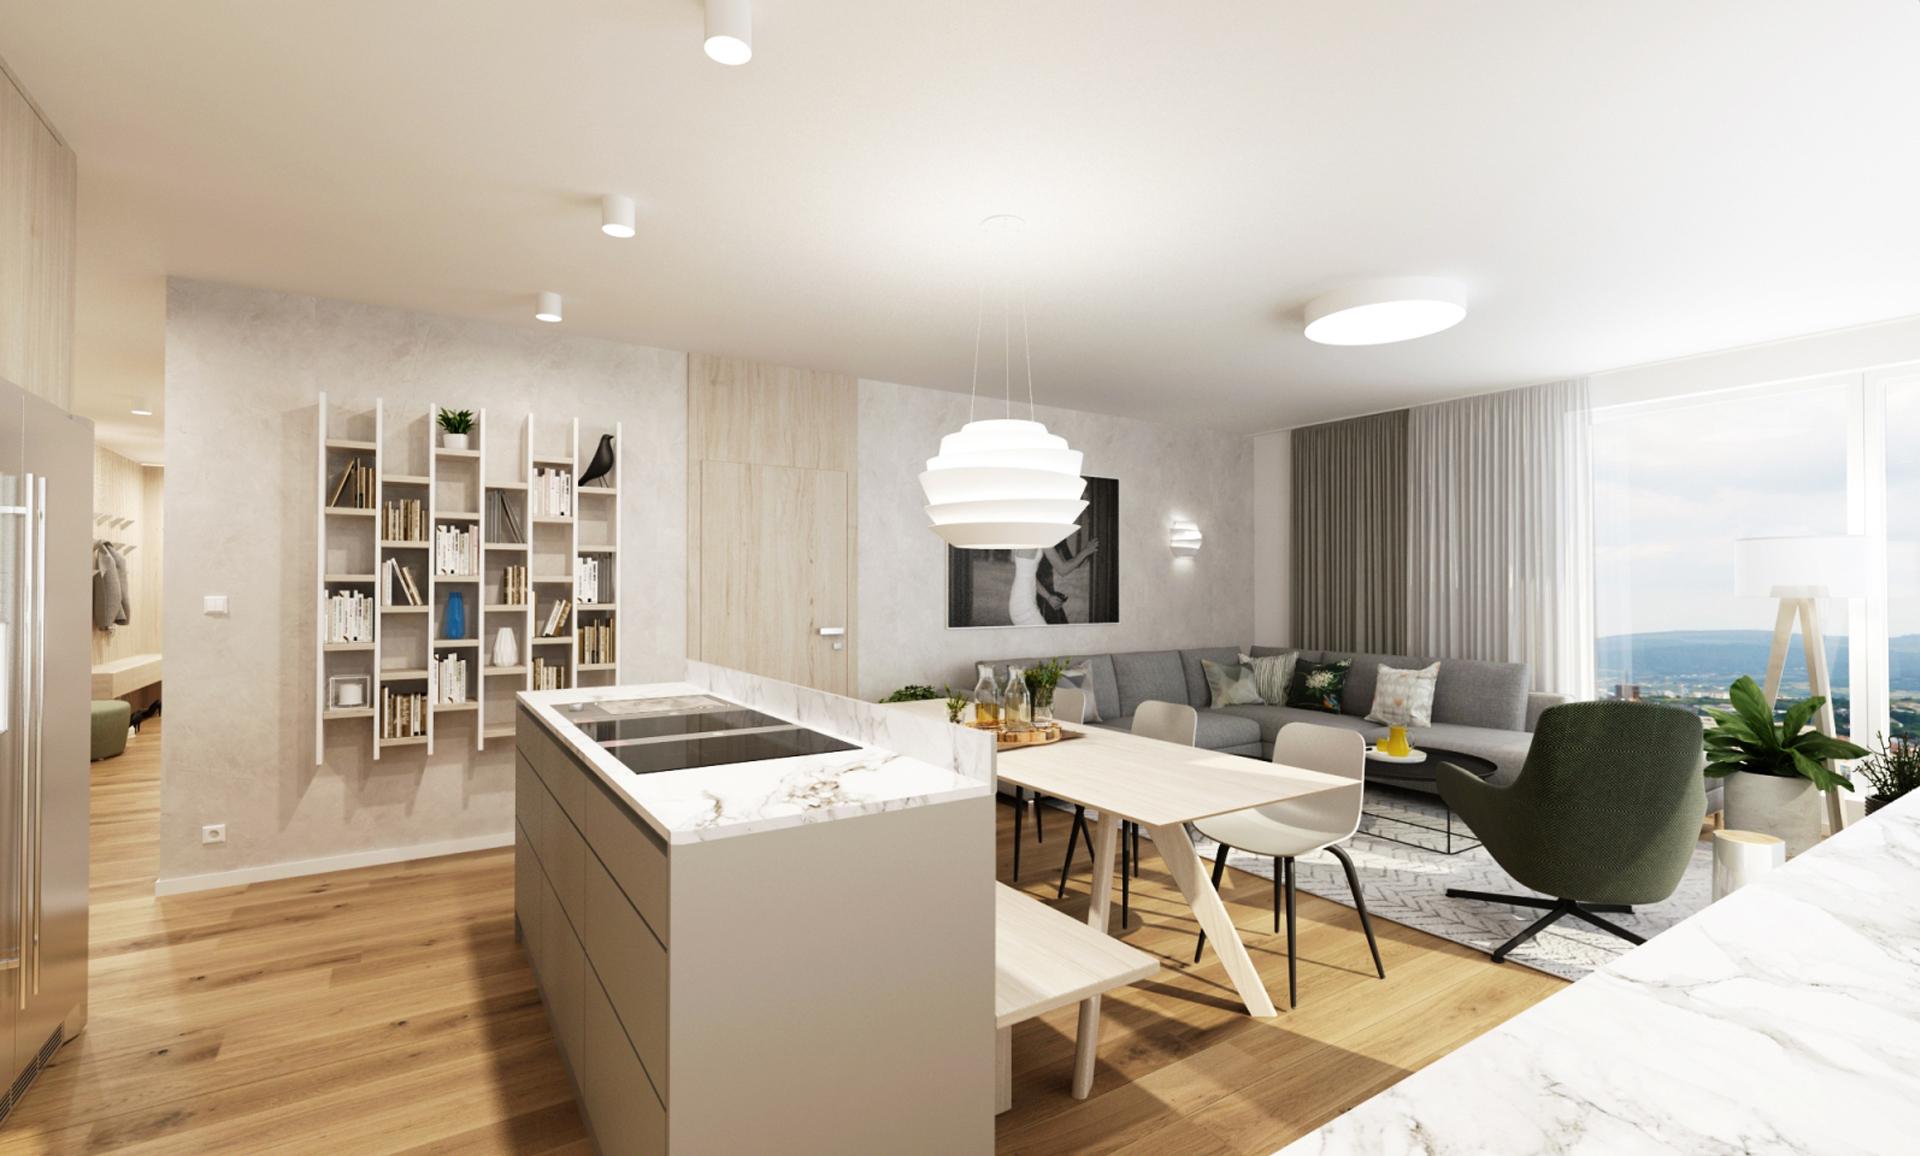 navrh interieru bytu, navrh interieru kocelova, rezidencia kocelova, bora, bora professional, navrh interieru kuchyne, vizualizacie kuchyne, vizualizacie, navrh kuchyne, dizajn jedalne, interierovy dizajner, hay chair, foscarini, le soleil, zanotta, kent armchair, interierovy dizajn, bieleny dub, navrh kuchyne s jedalnou, navrh penthouse bratislava, navrh interieru holobytu, navrh interieru bratislava